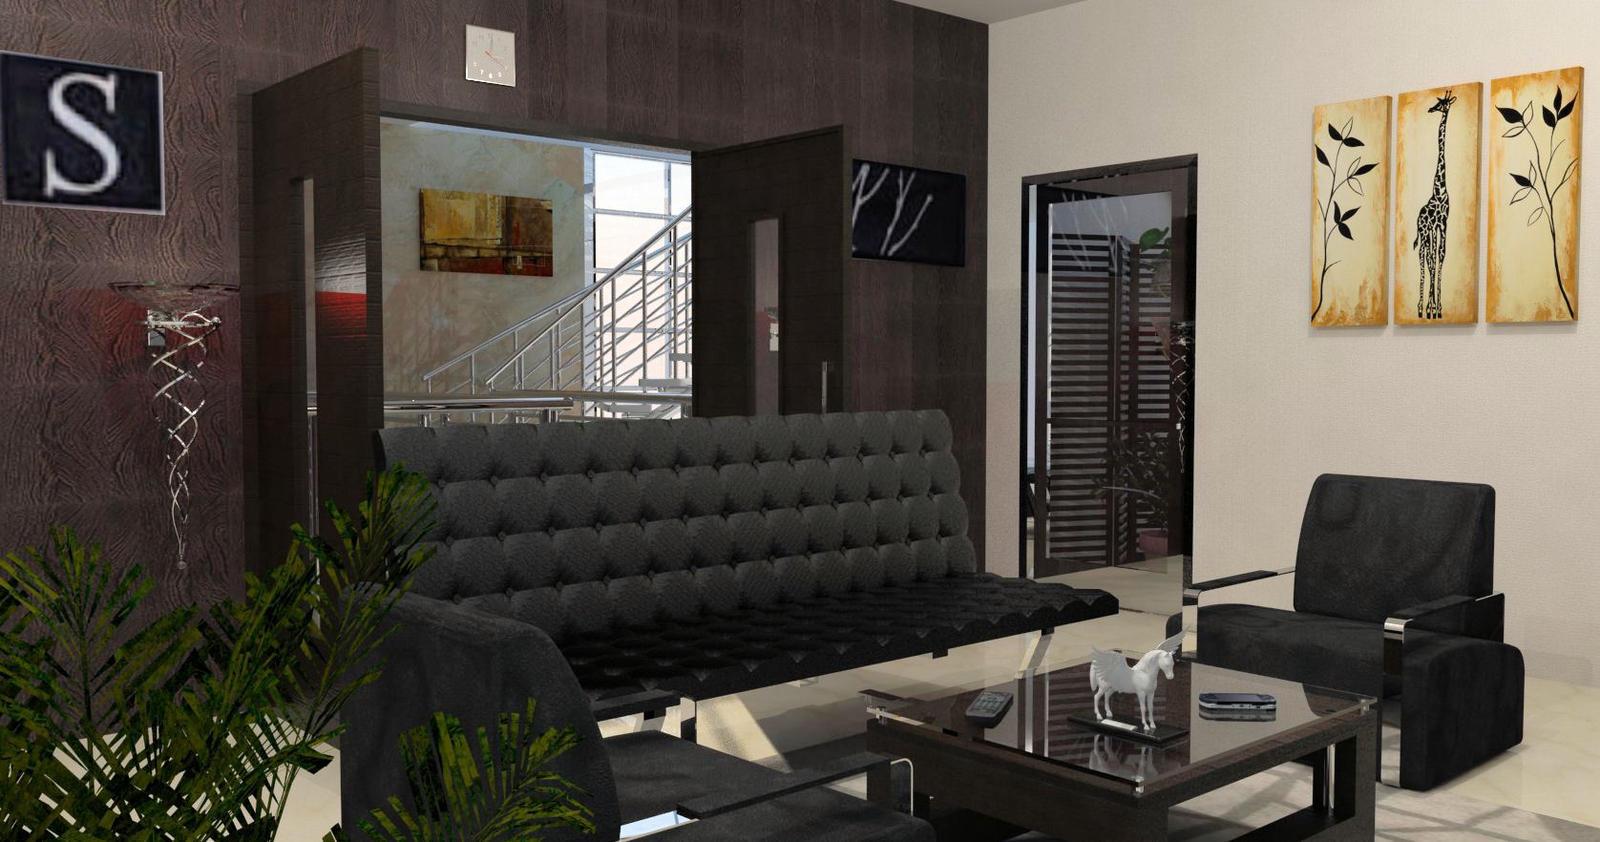 Terrazas marinas living room by l aprilwar l on deviantart for Terrazas living